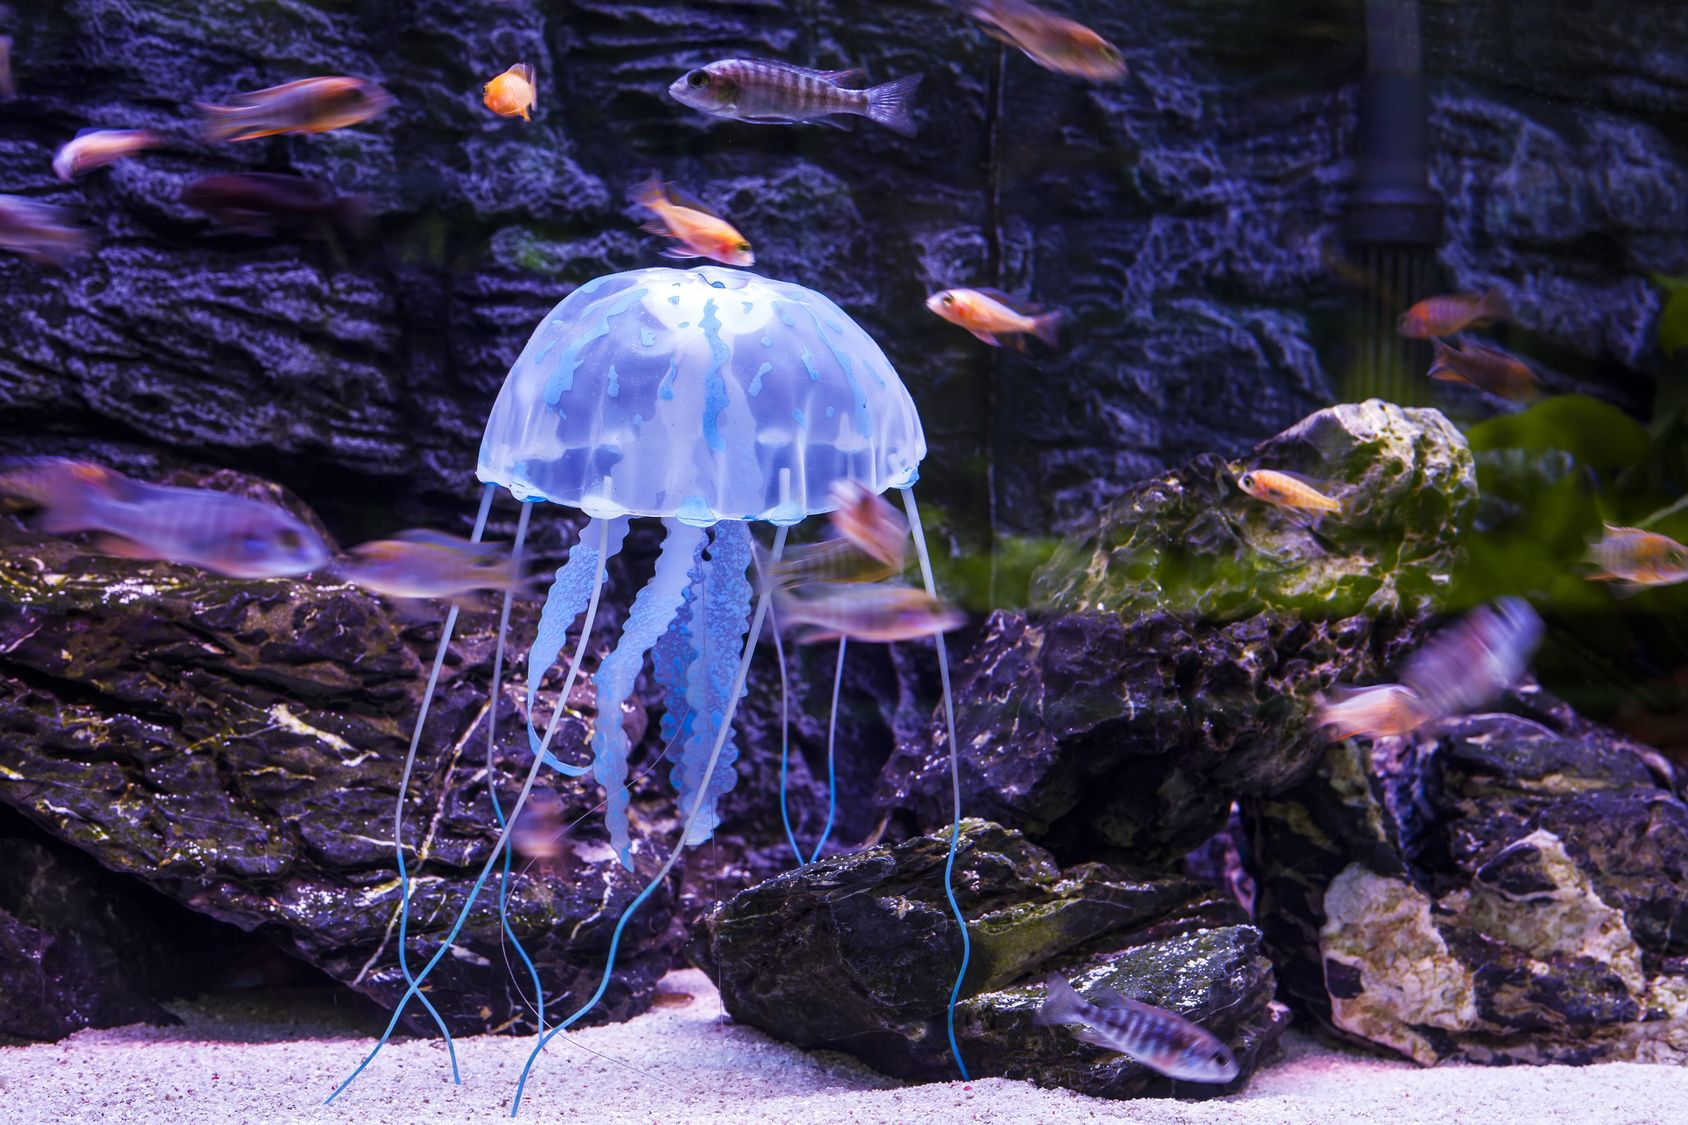 Аквариум своими руками с медузой